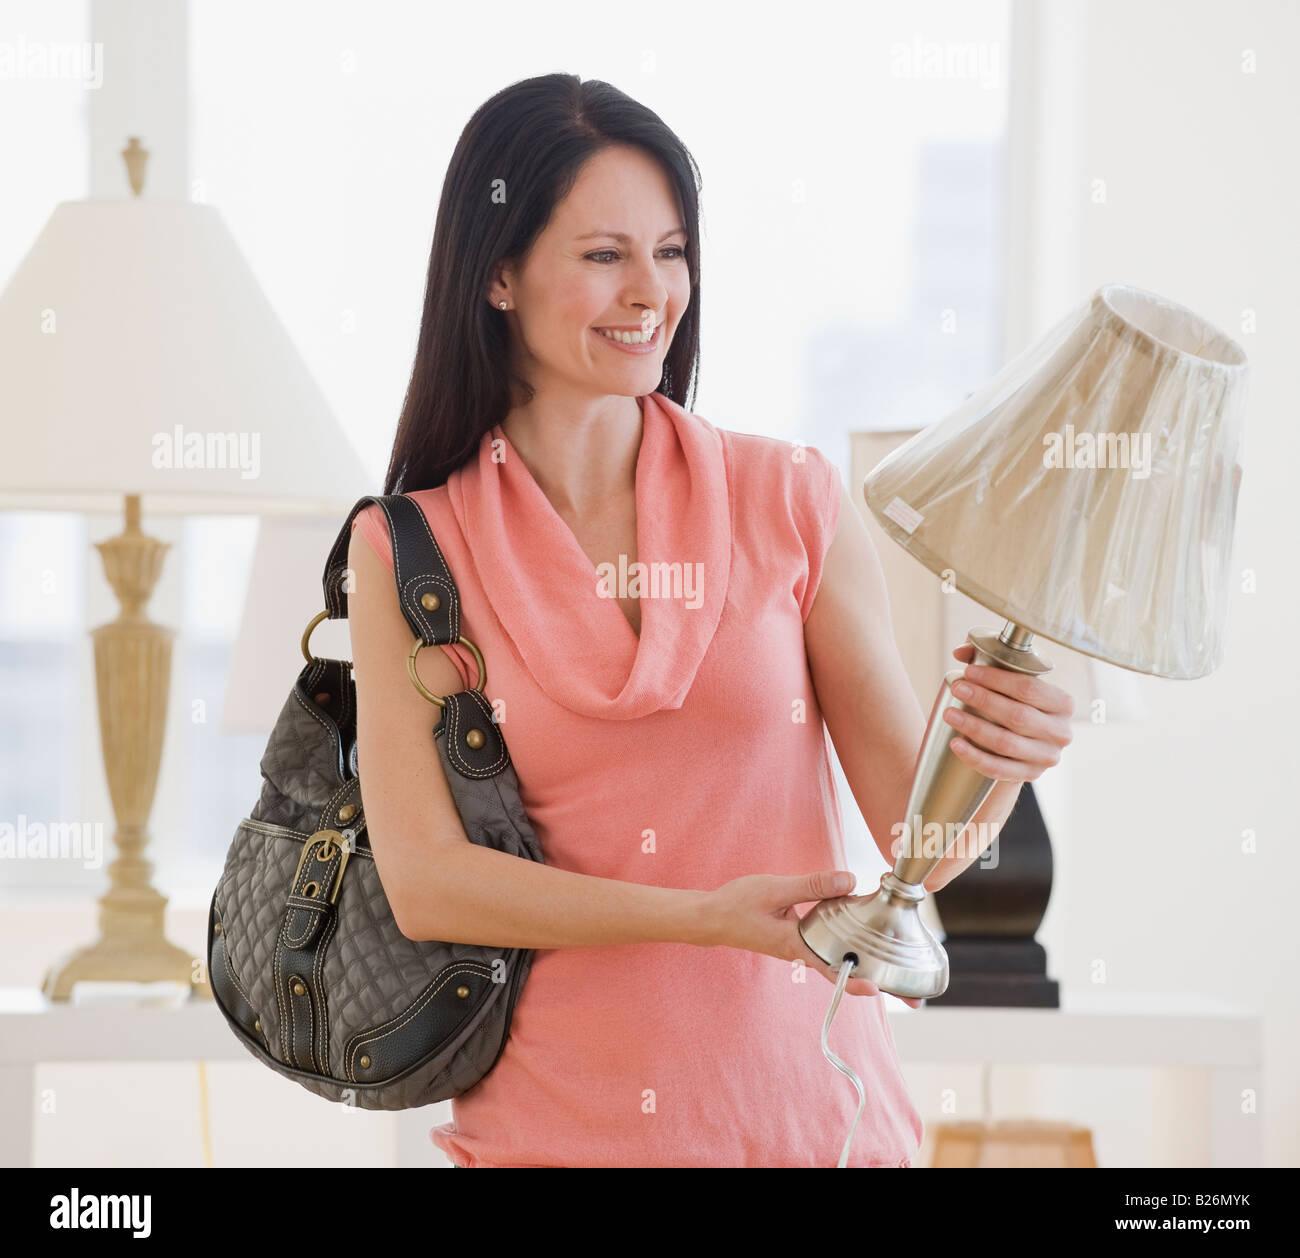 Woman shopping for lighting - Stock Image